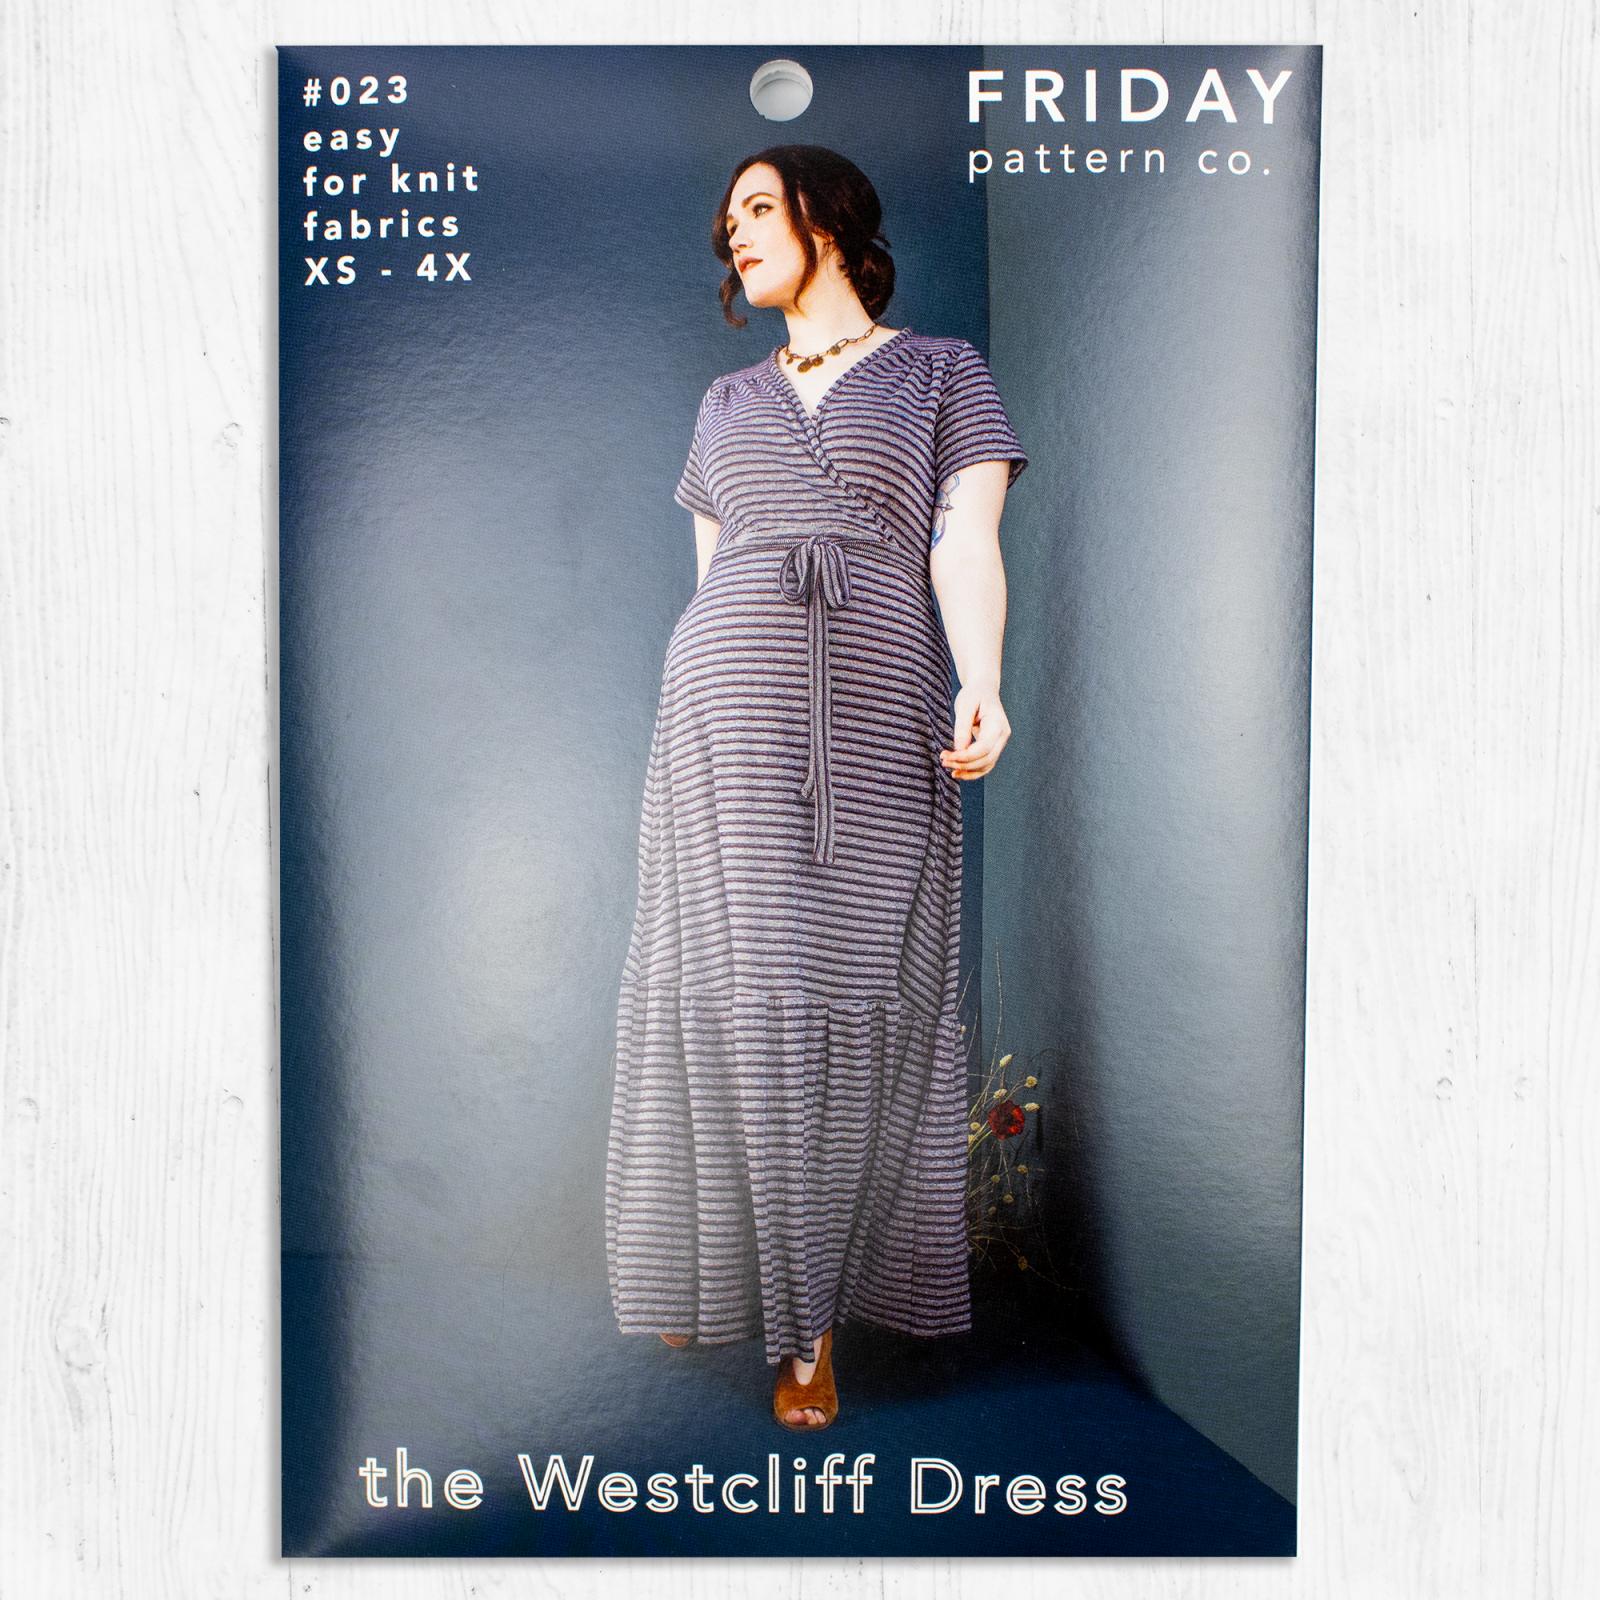 Friday Pattern Co. - The Westcliff Dress